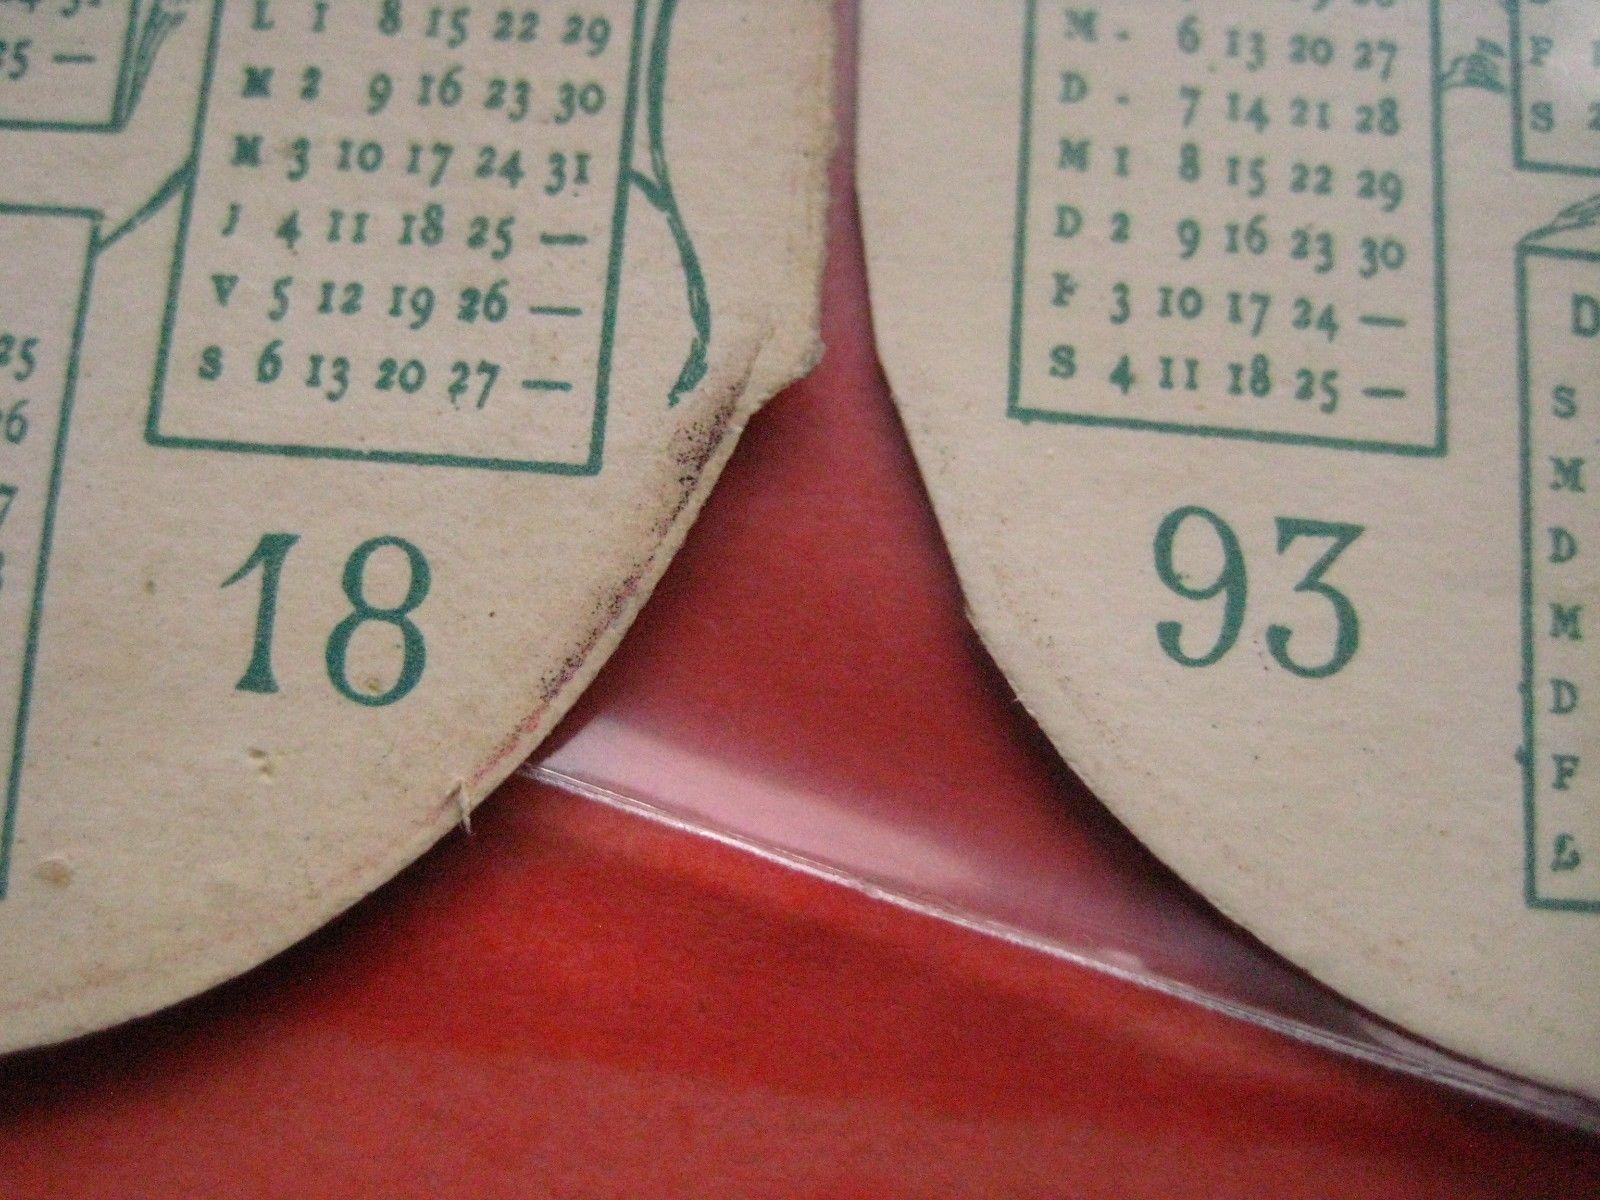 1 calendar 1893 card chocolate SUCHARD WIESER IV nr 4, mandolines cocoa drinking